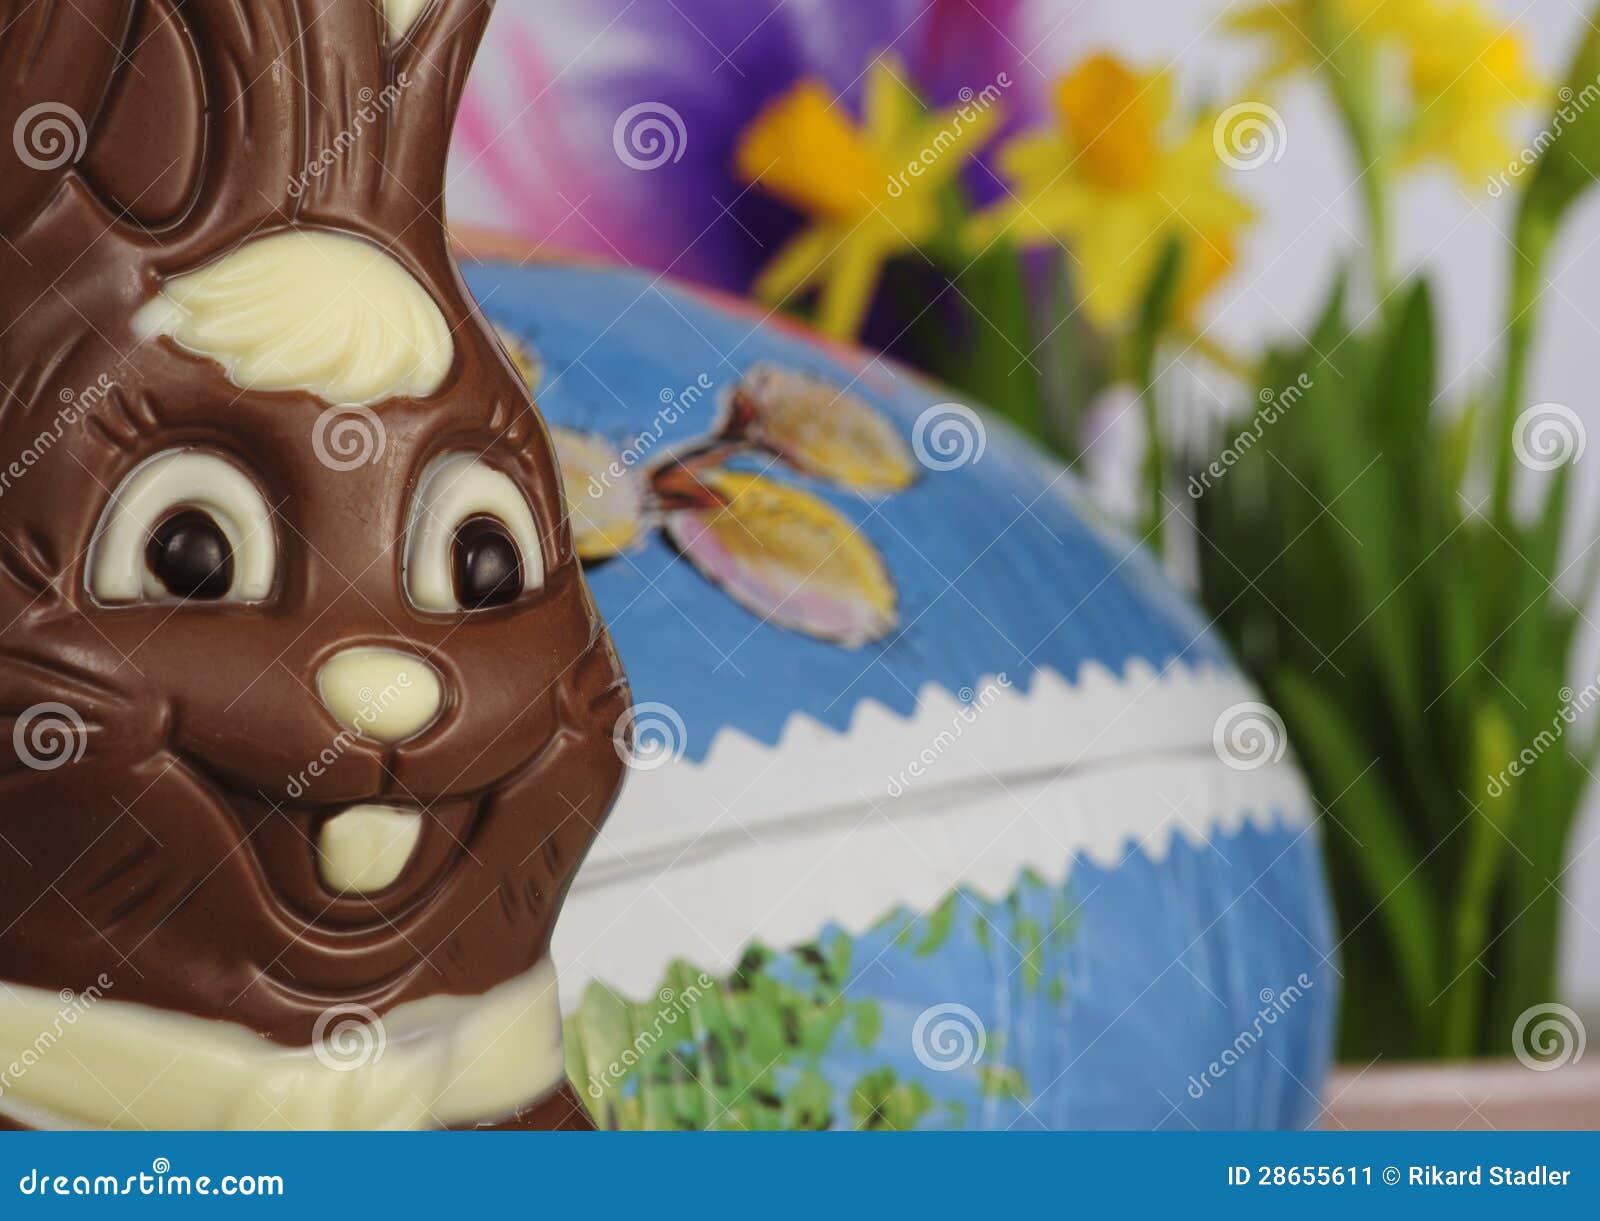 Download Easter bunny stock image. Image of celebration, seasonal - 28655611